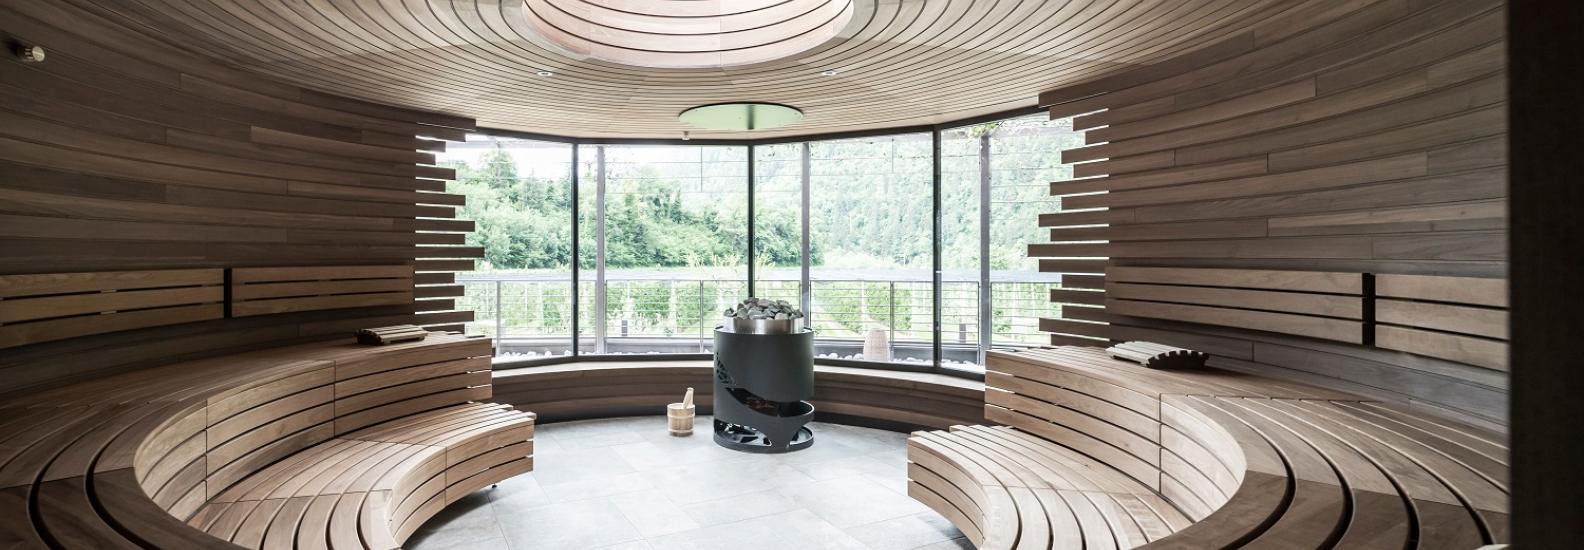 devine - sauna - apfelhotel torgglerhof - saltaus - ©alex filz